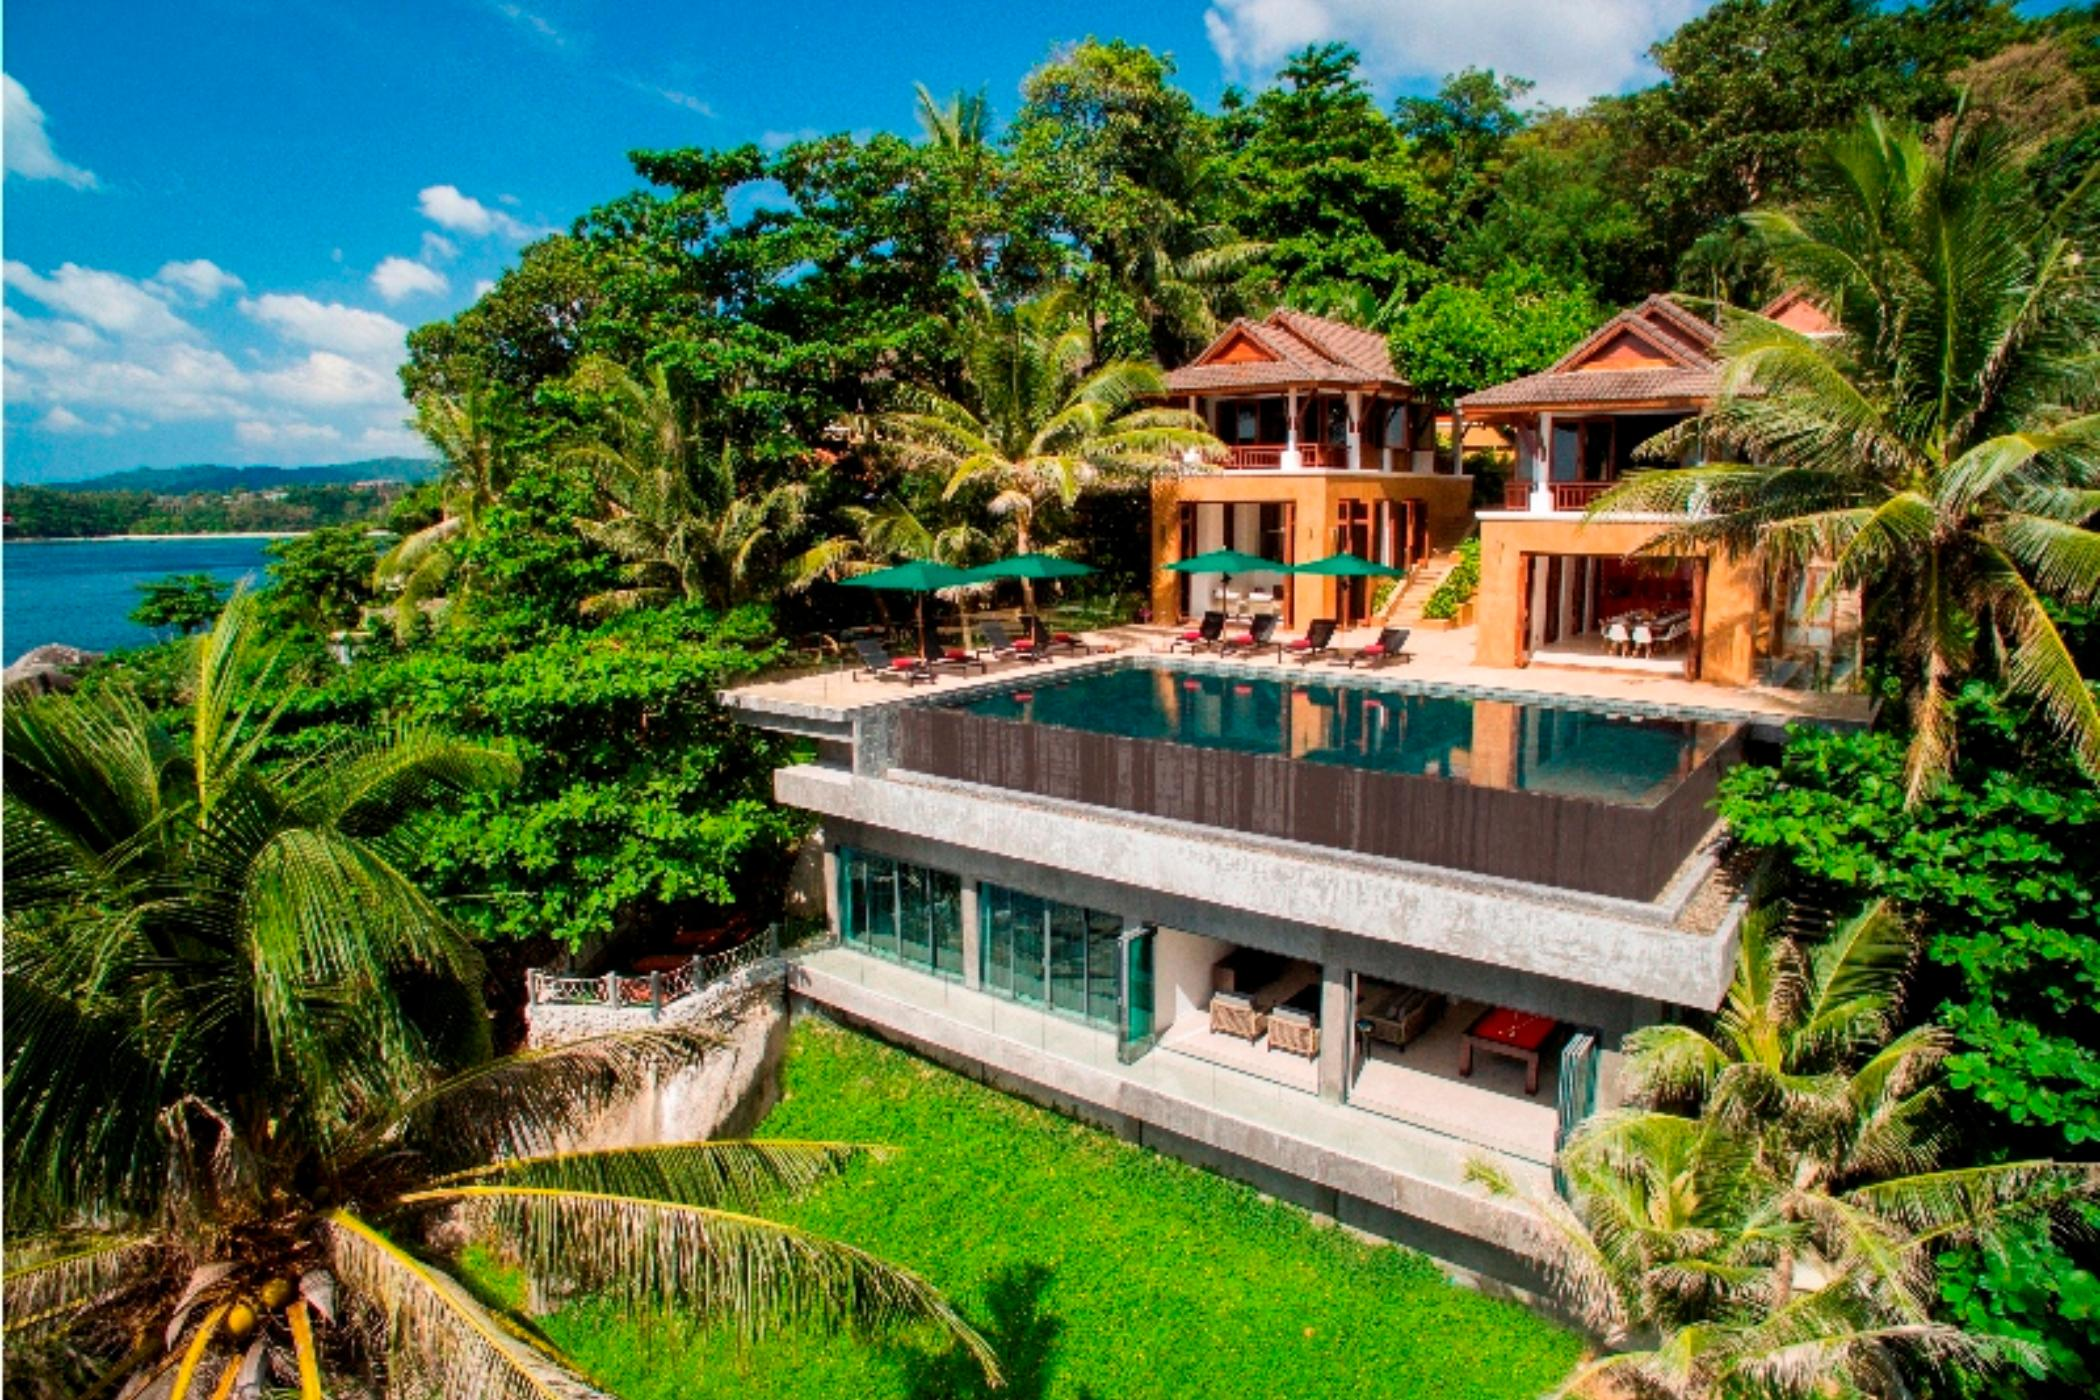 Villa Sunyata